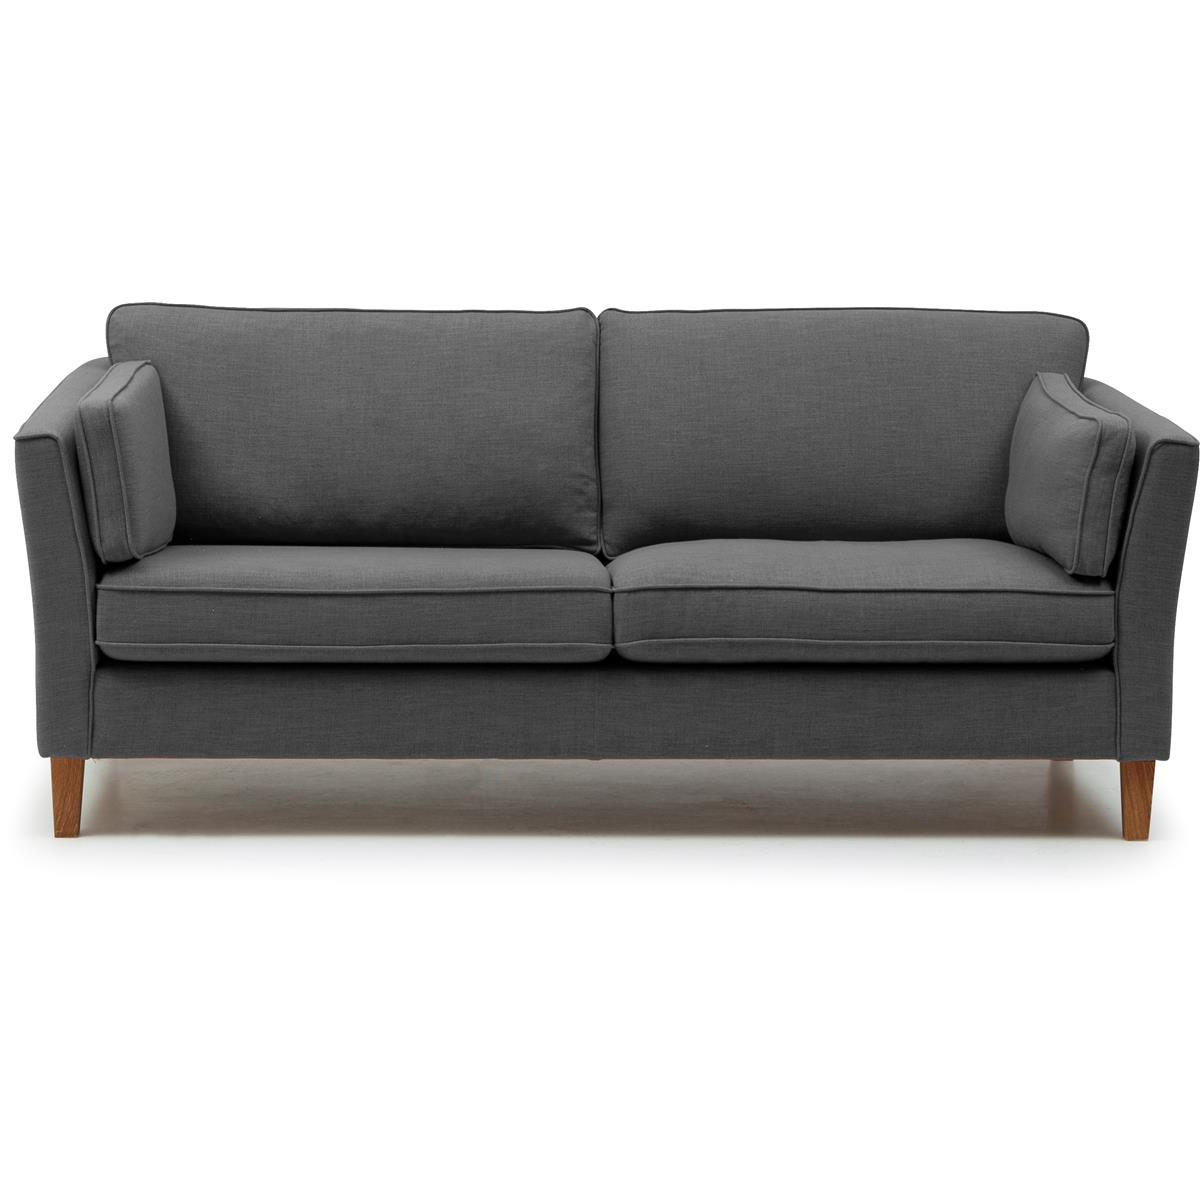 Carisma-soffa-3-sits-tyg-nordic-färg4-b